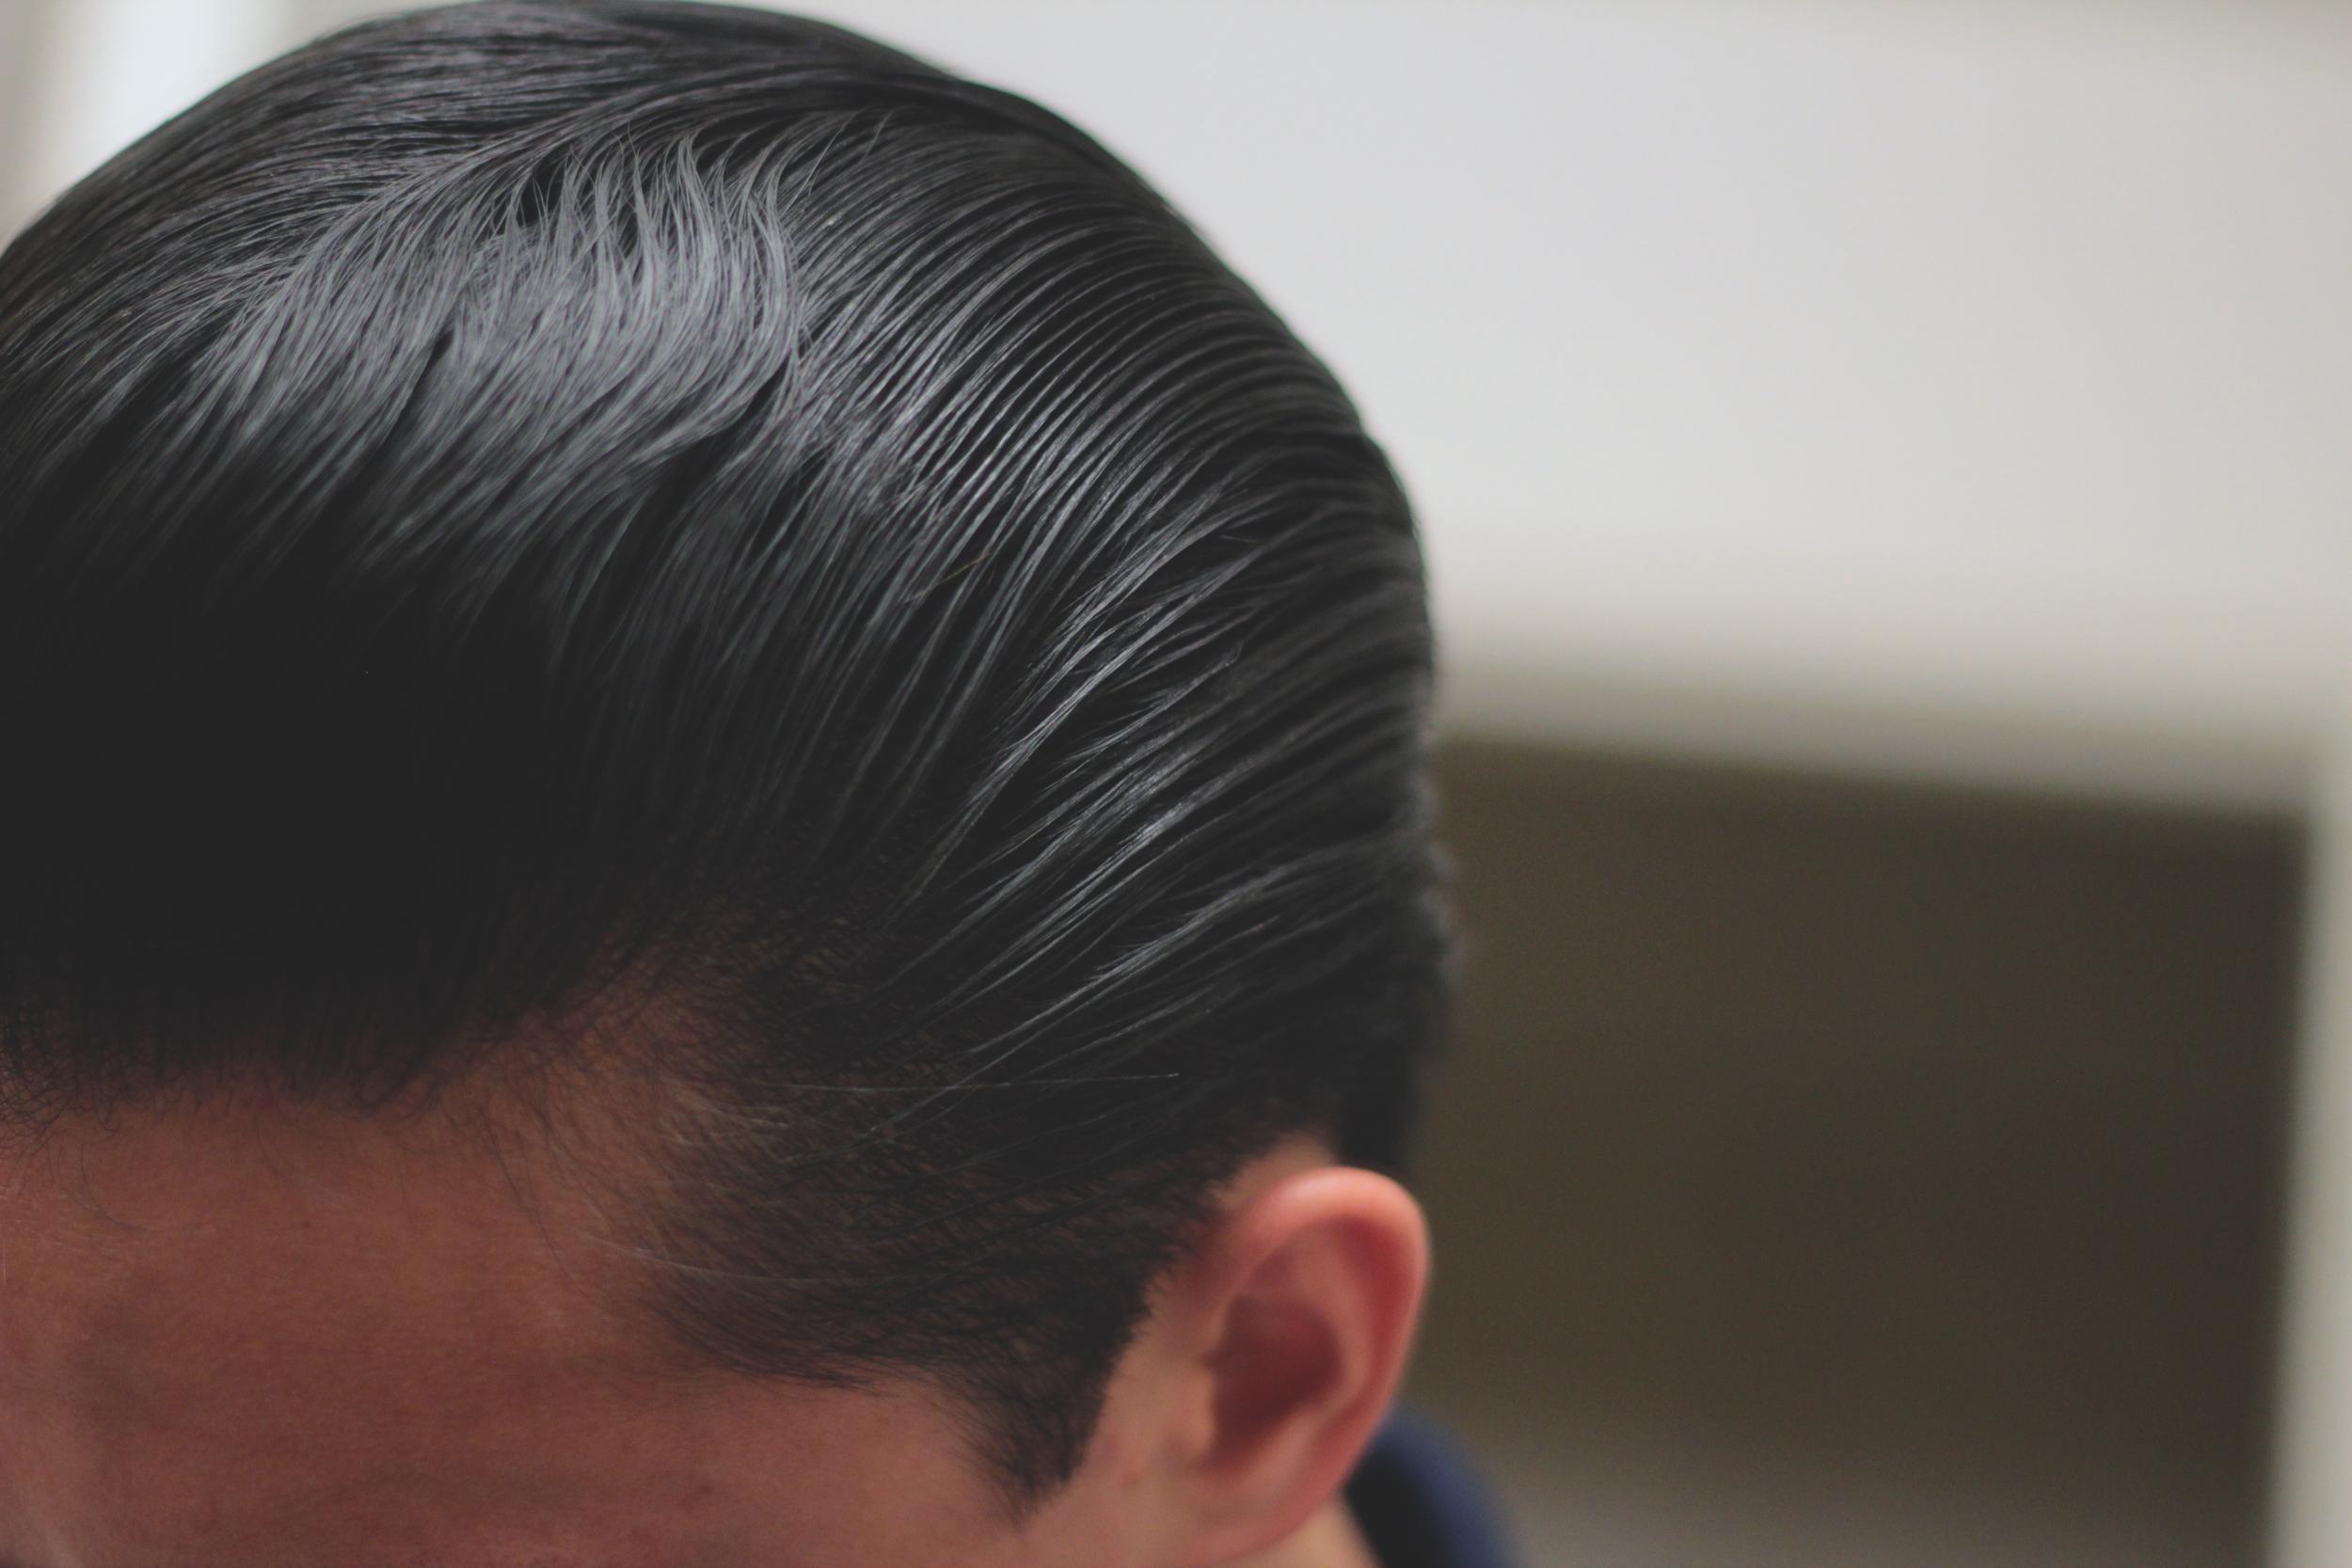 Imperial Classic Pomade - pomp slickness